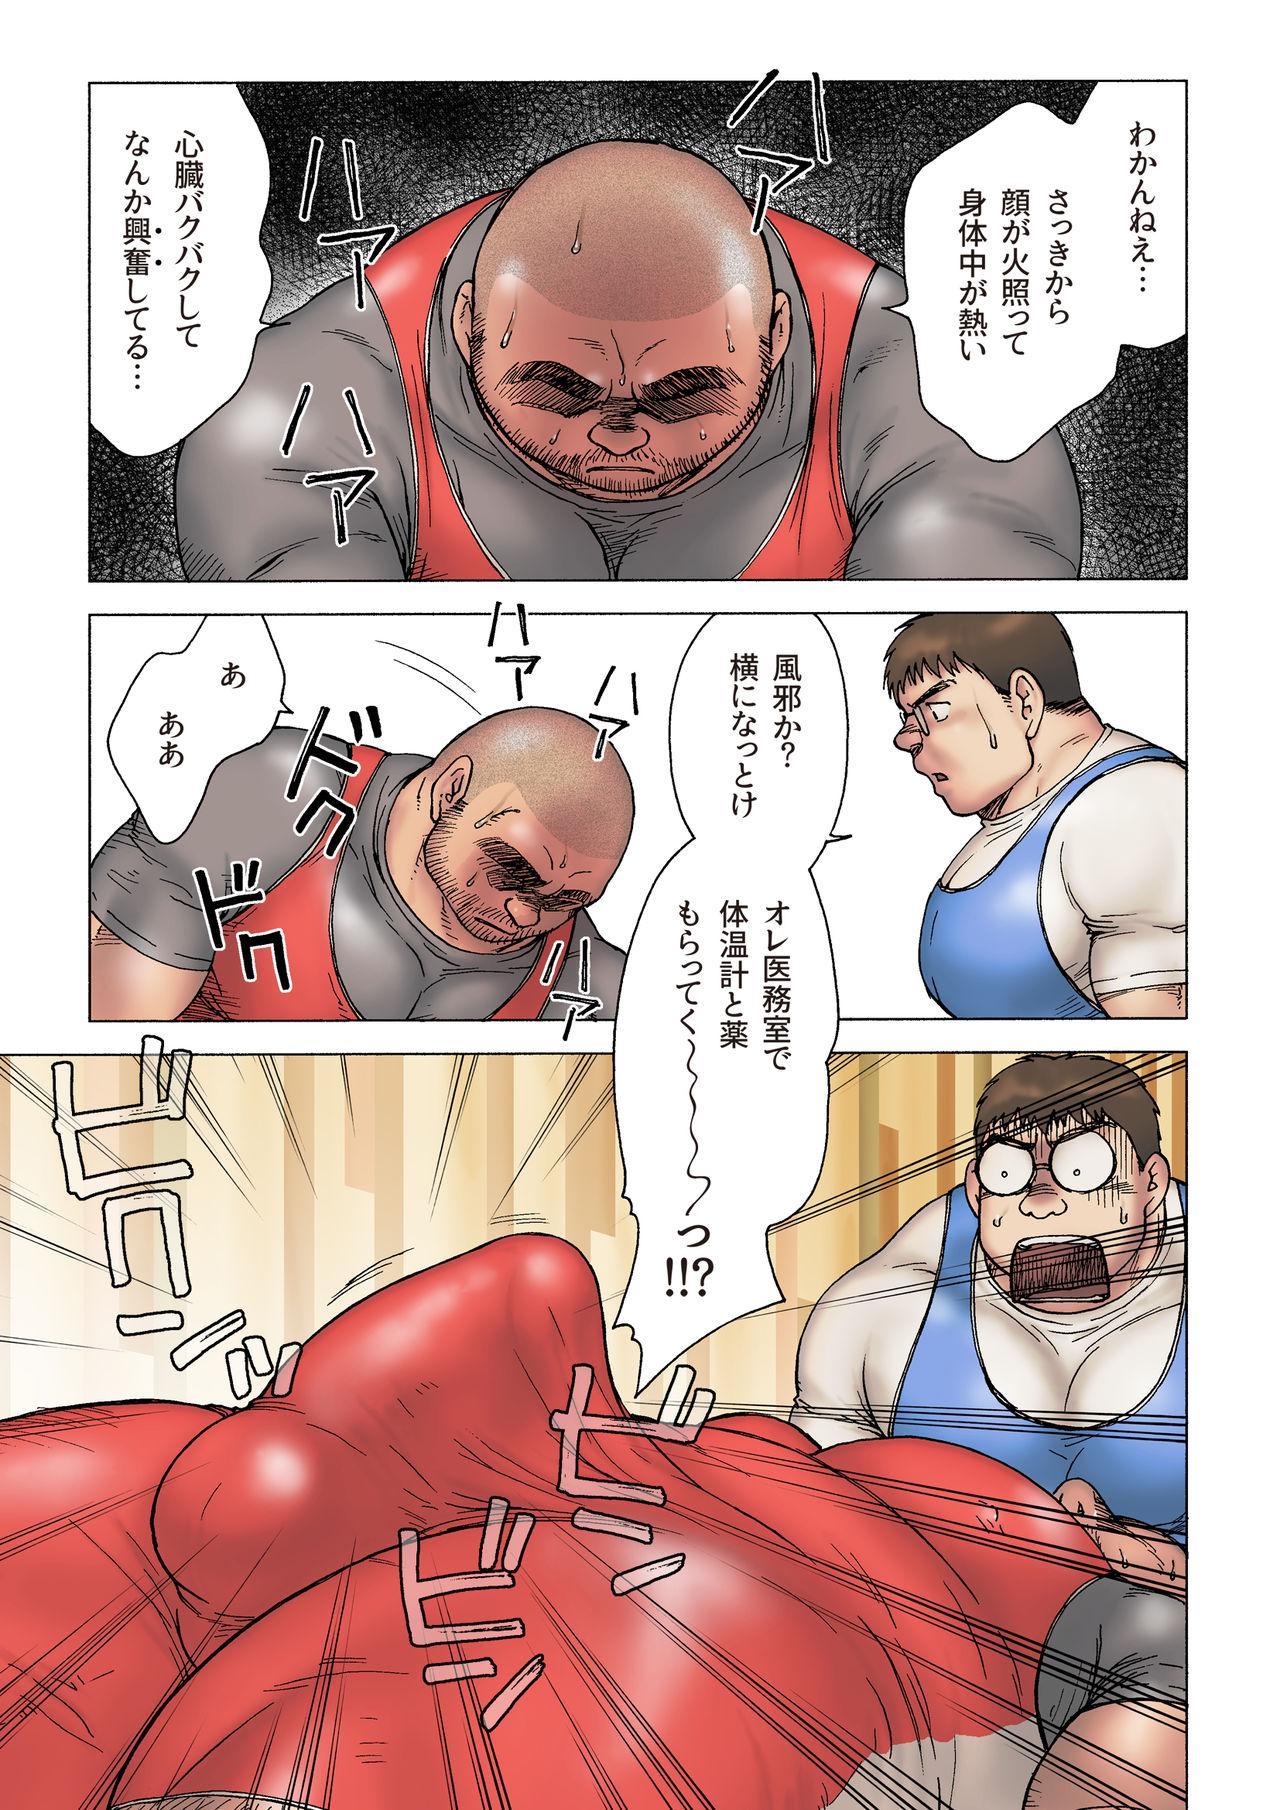 Danshi Koukousei Weightlifter Shiai-chuu, Osae kirenai Wakai Takeri 10